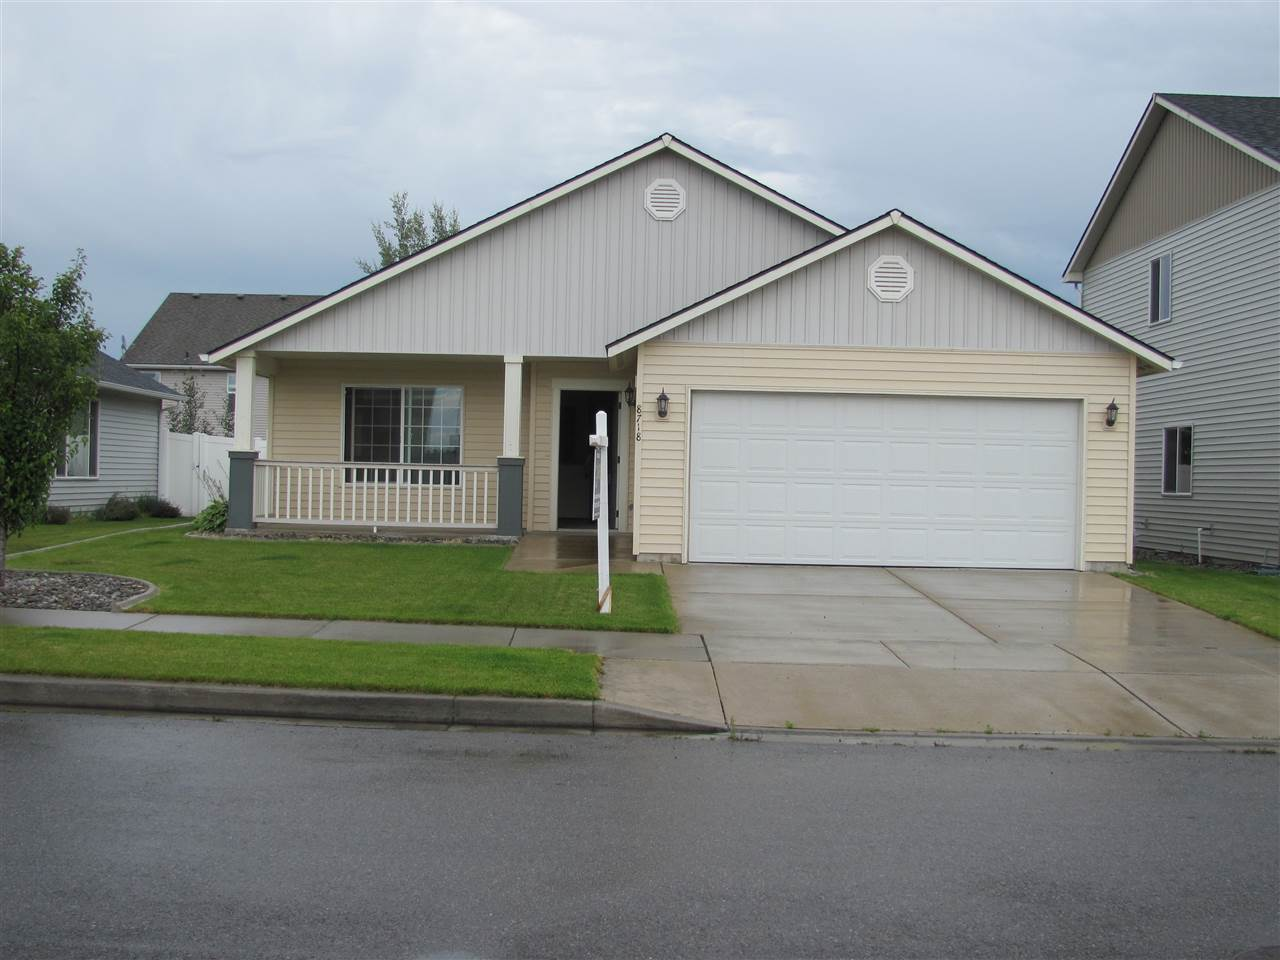 8718 N Elm St, Spokane, WA 99208